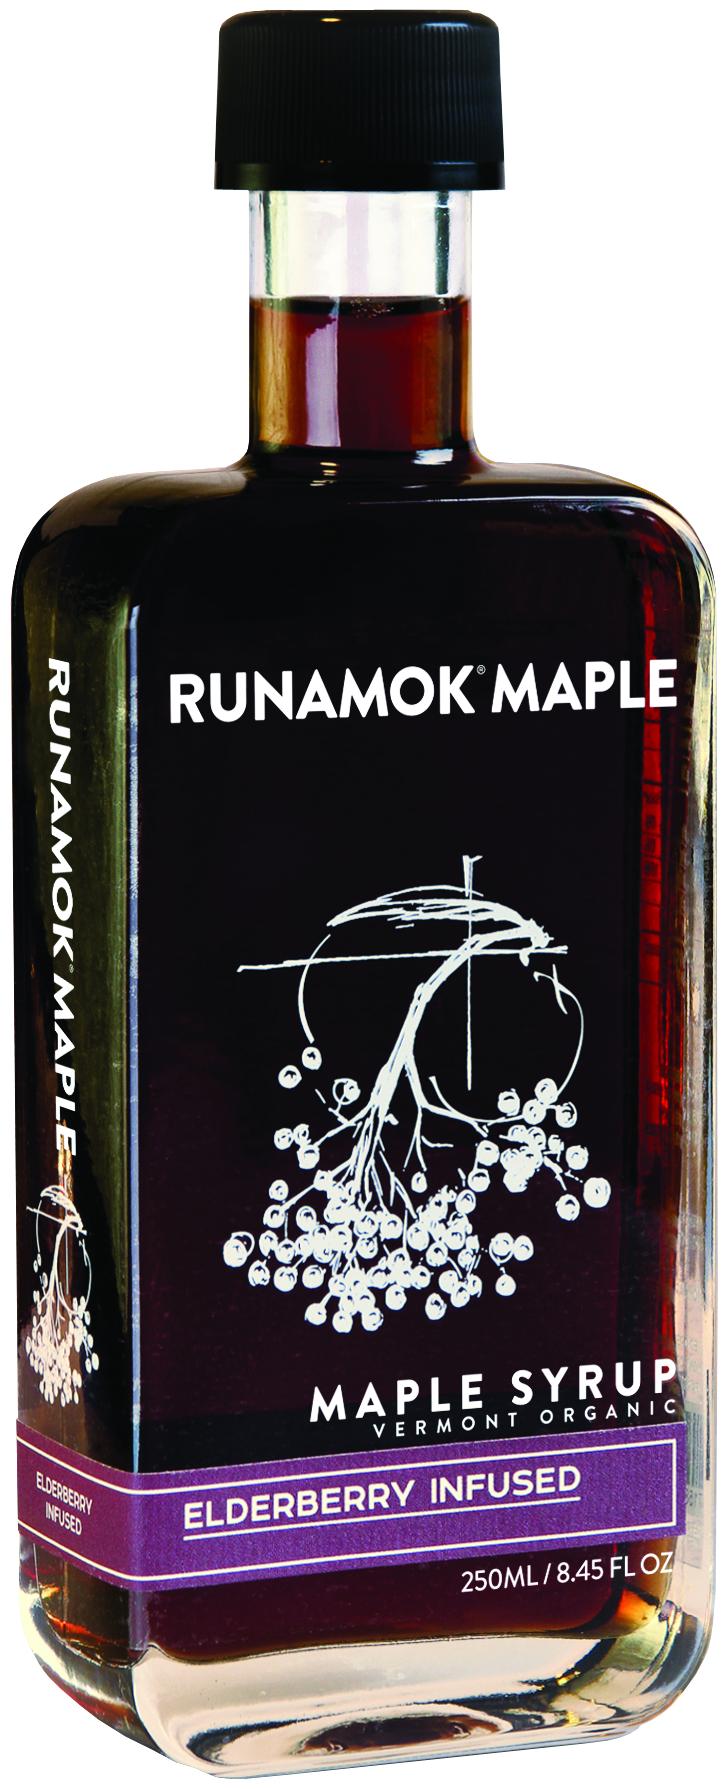 Runamok Maple Syrups